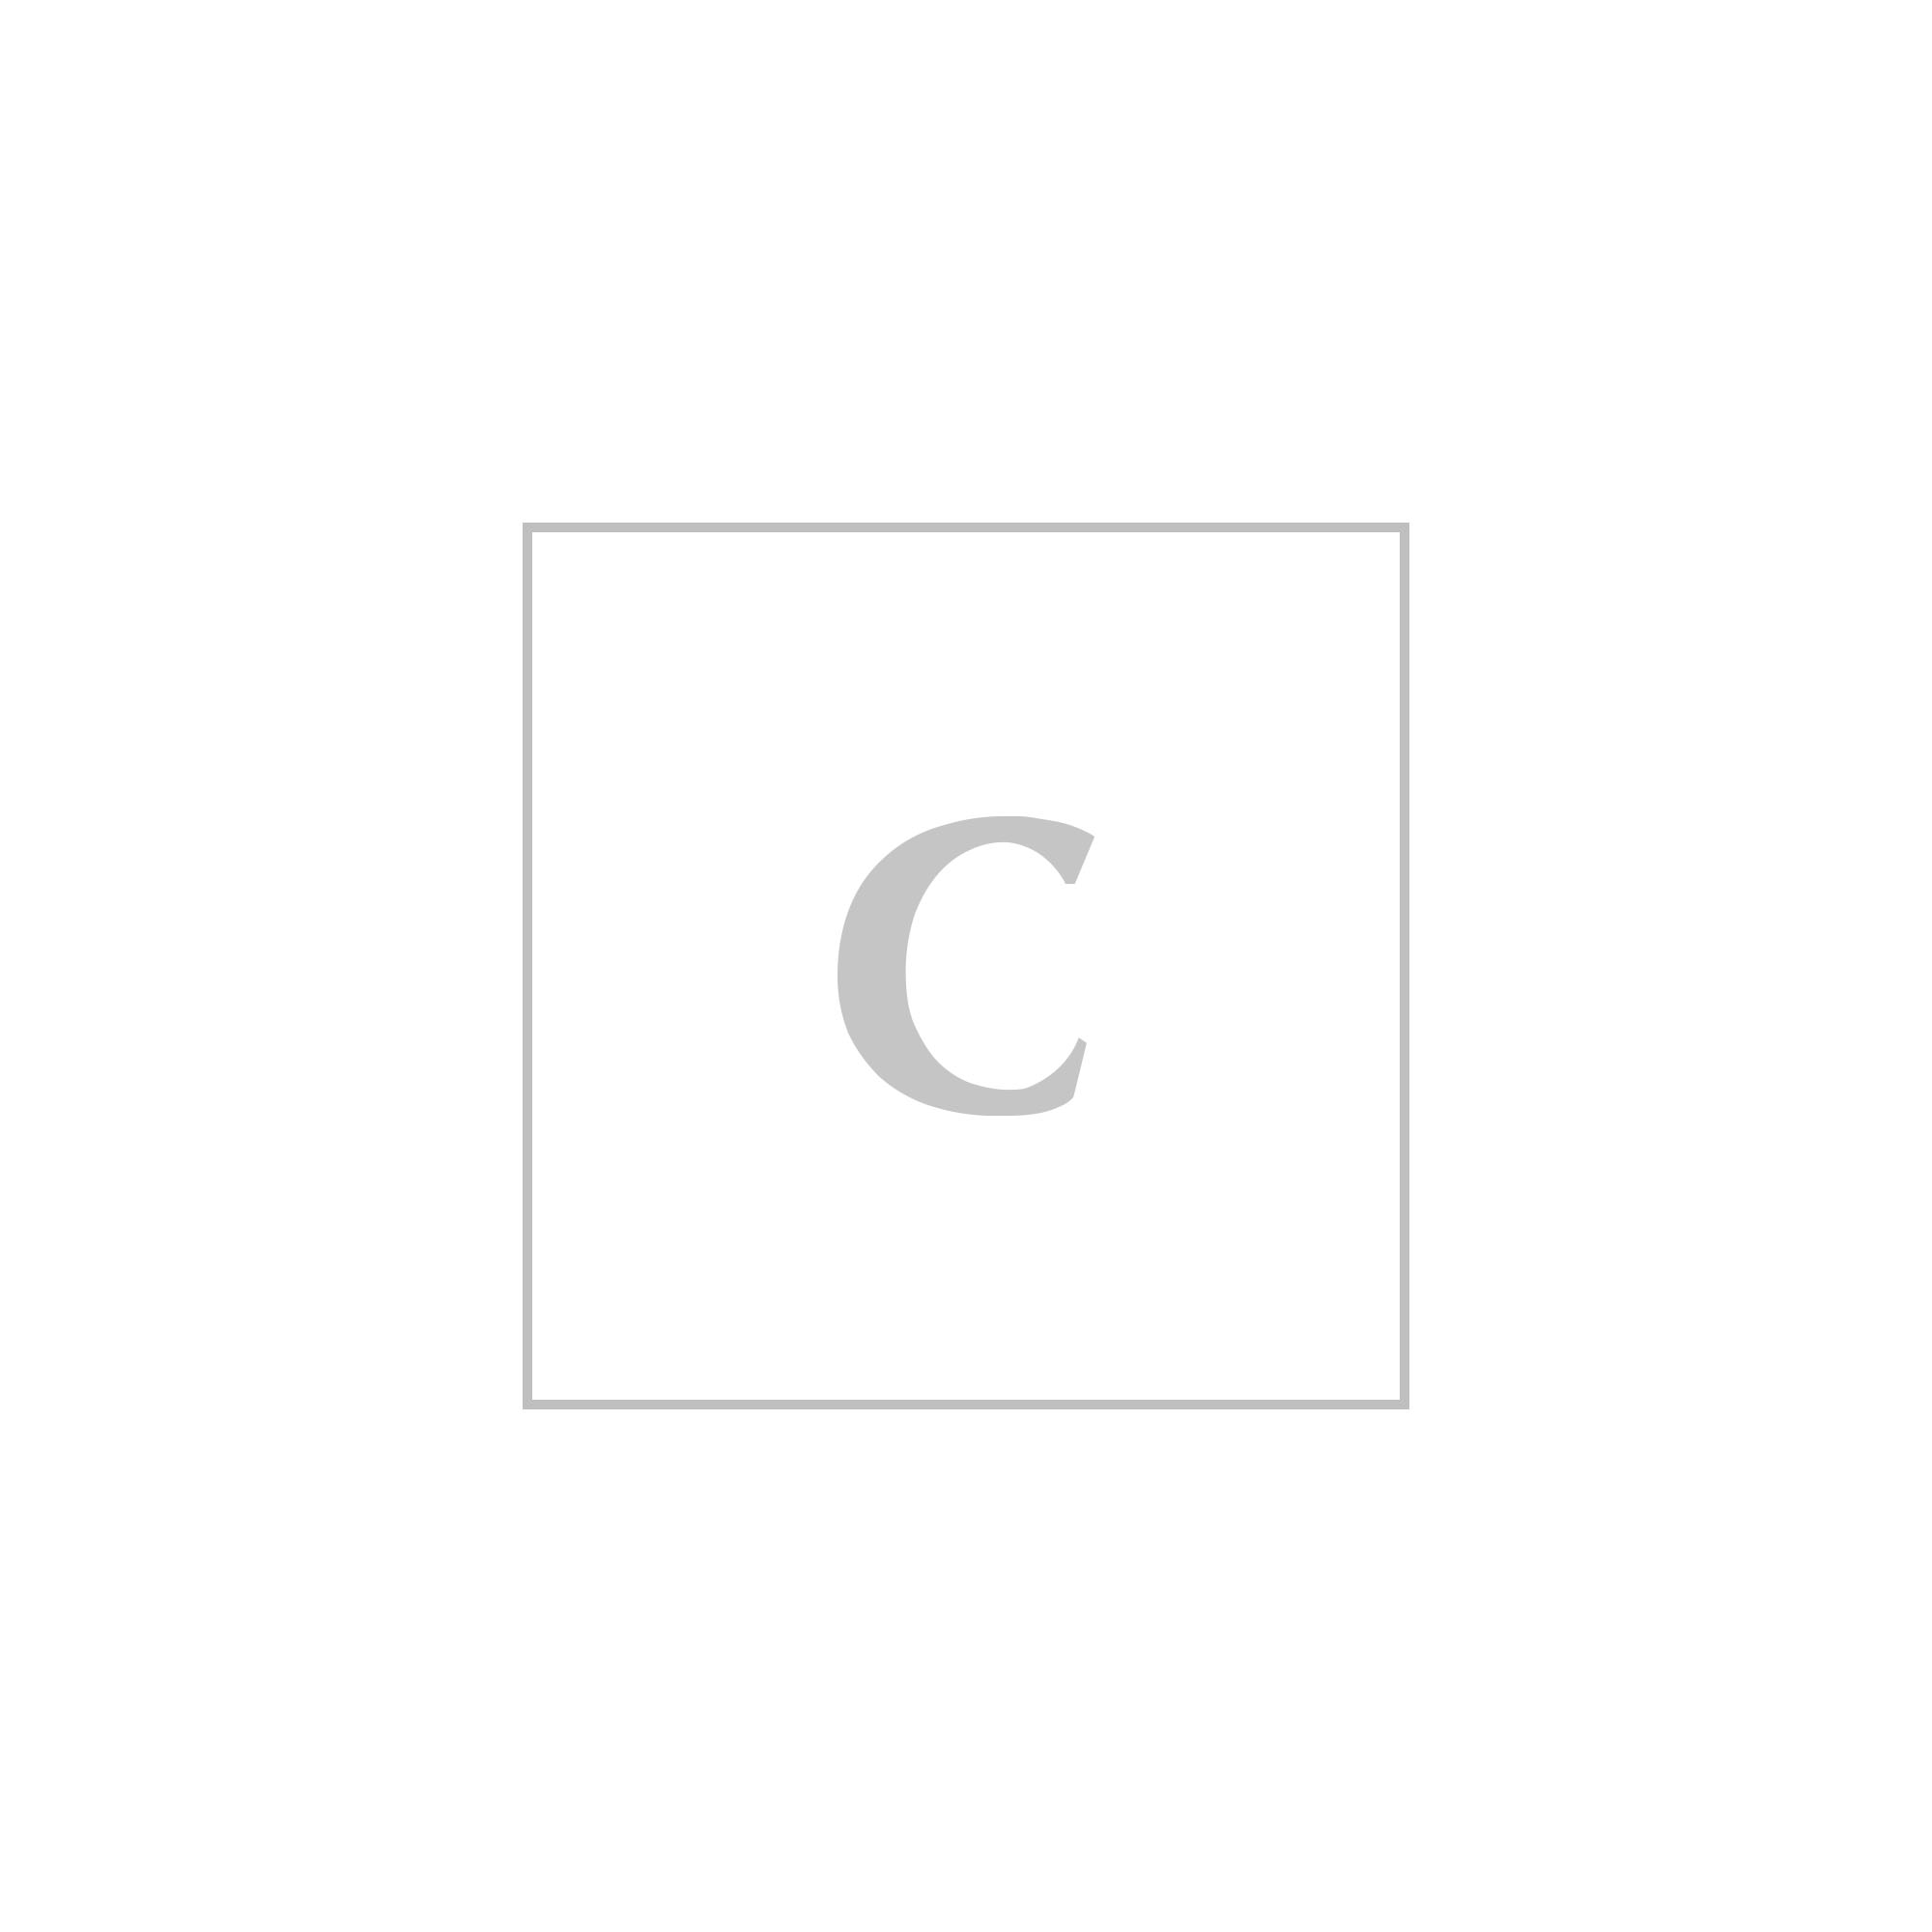 42e759bced0f VELVET HANDBAG WITH CAHIER EMBROIDERY